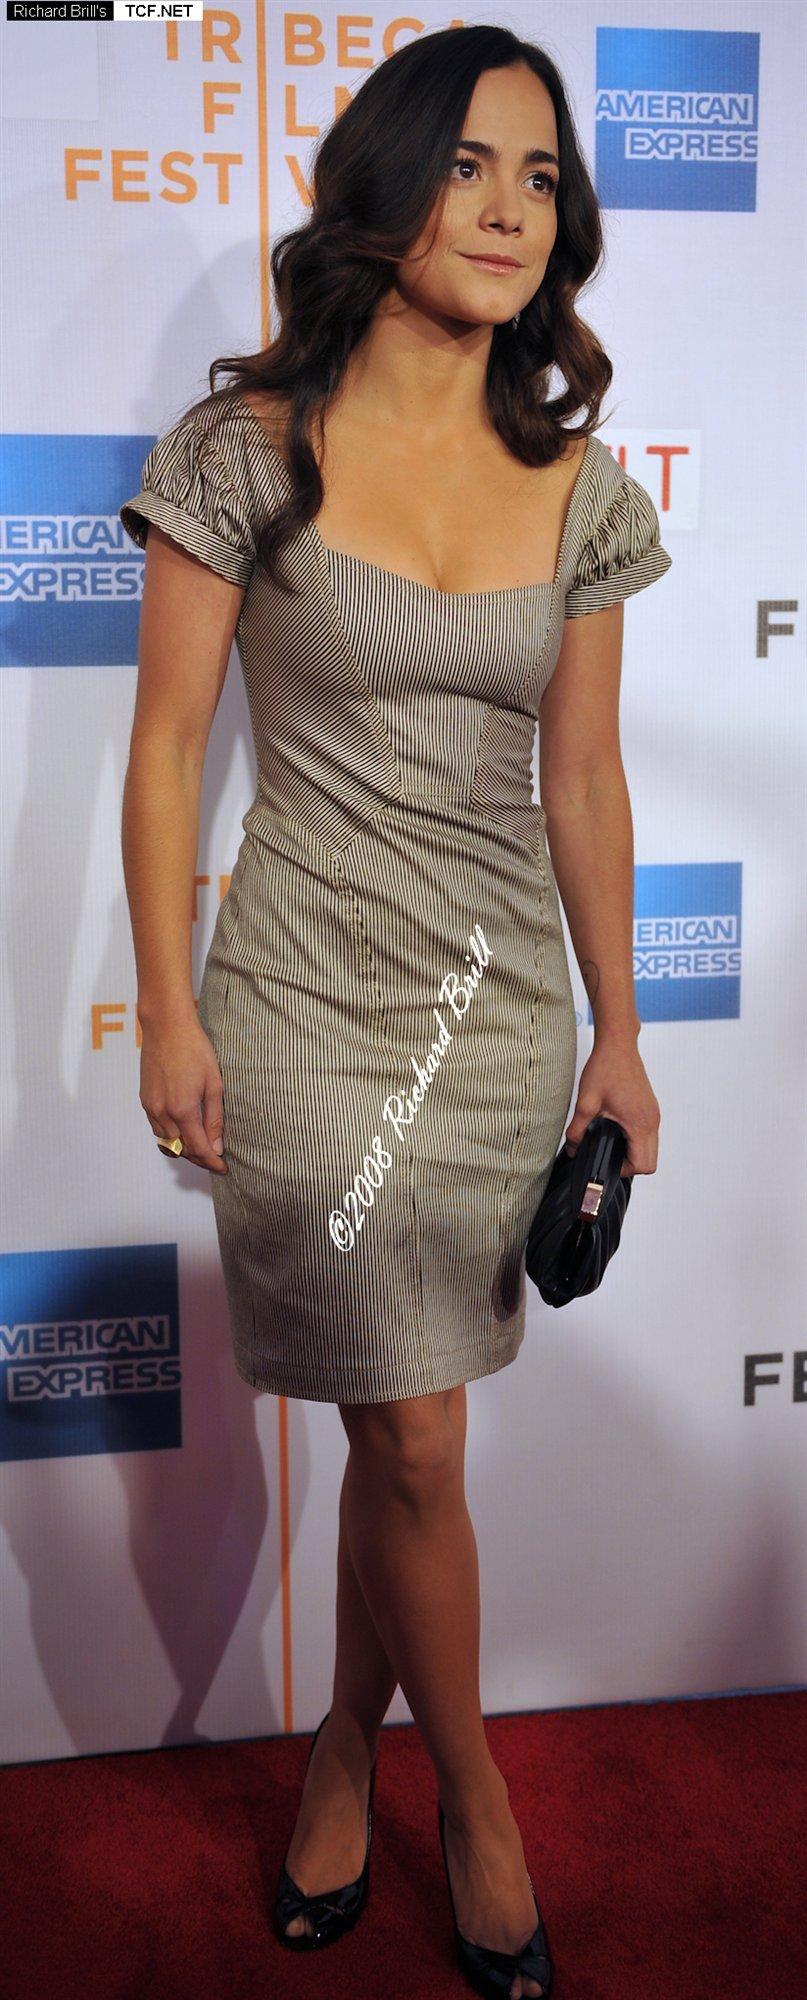 Alice Braga leaked wallpapers